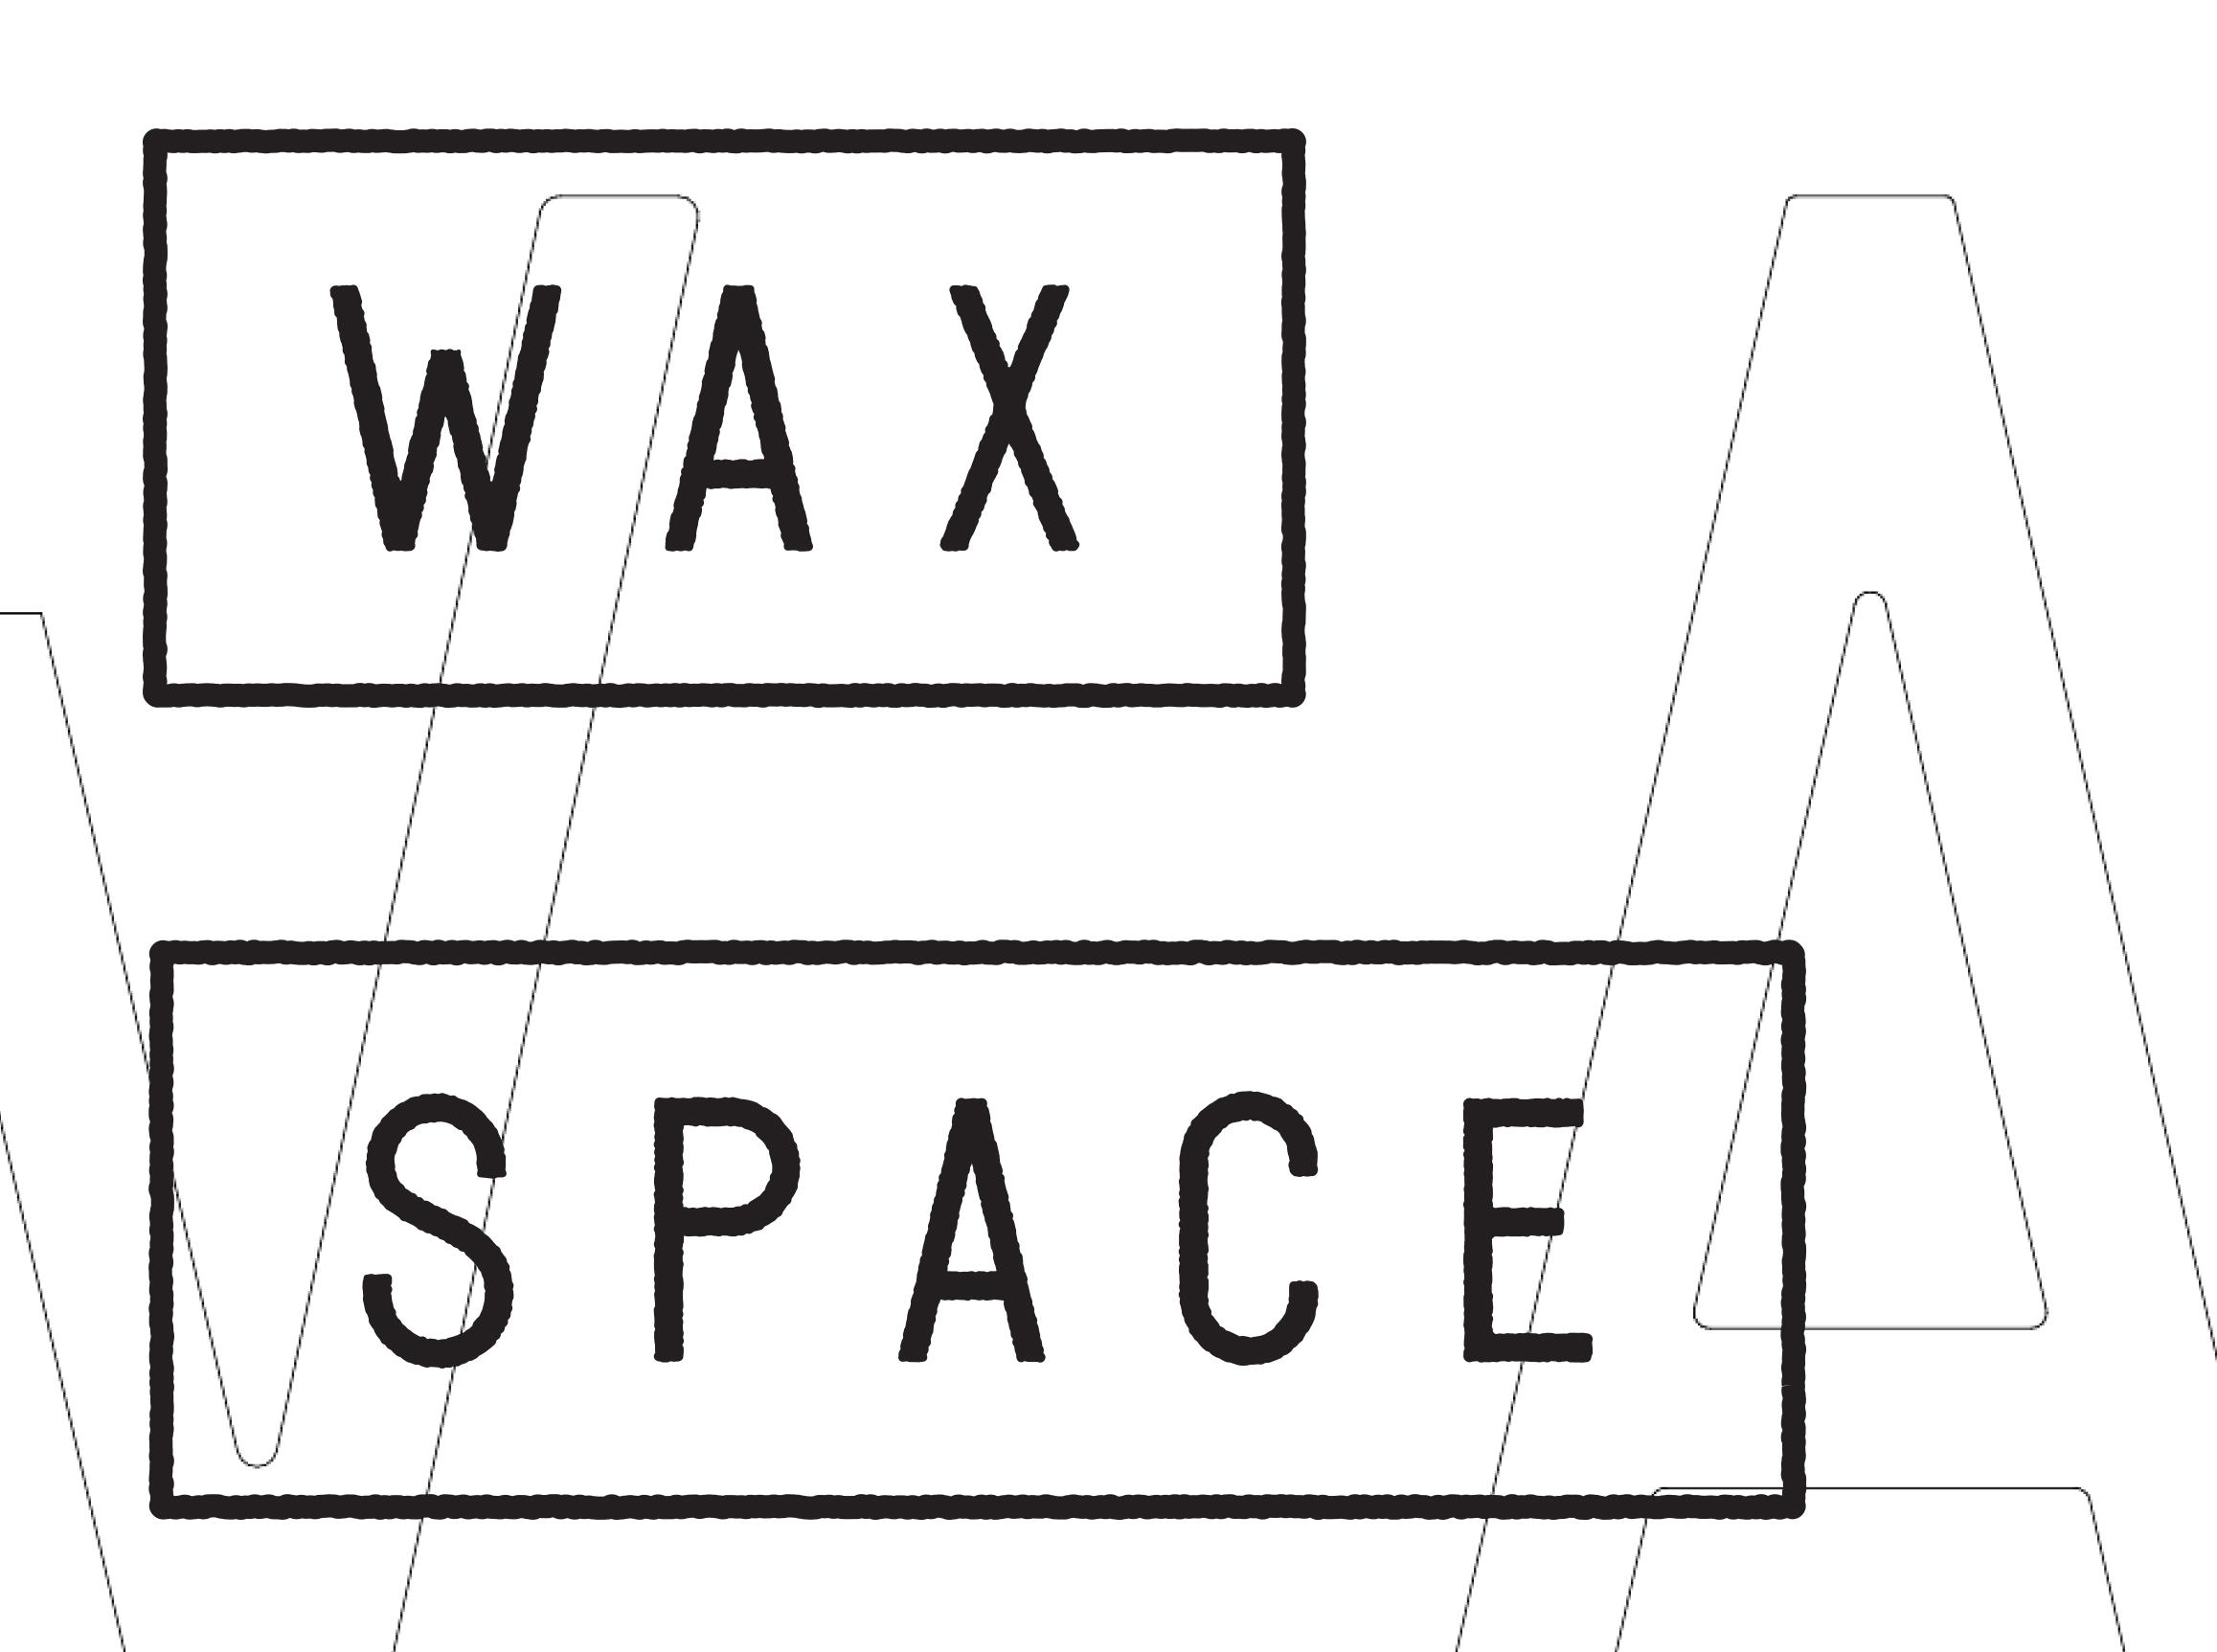 WaxSpace-rebrand-2a-2.jpg